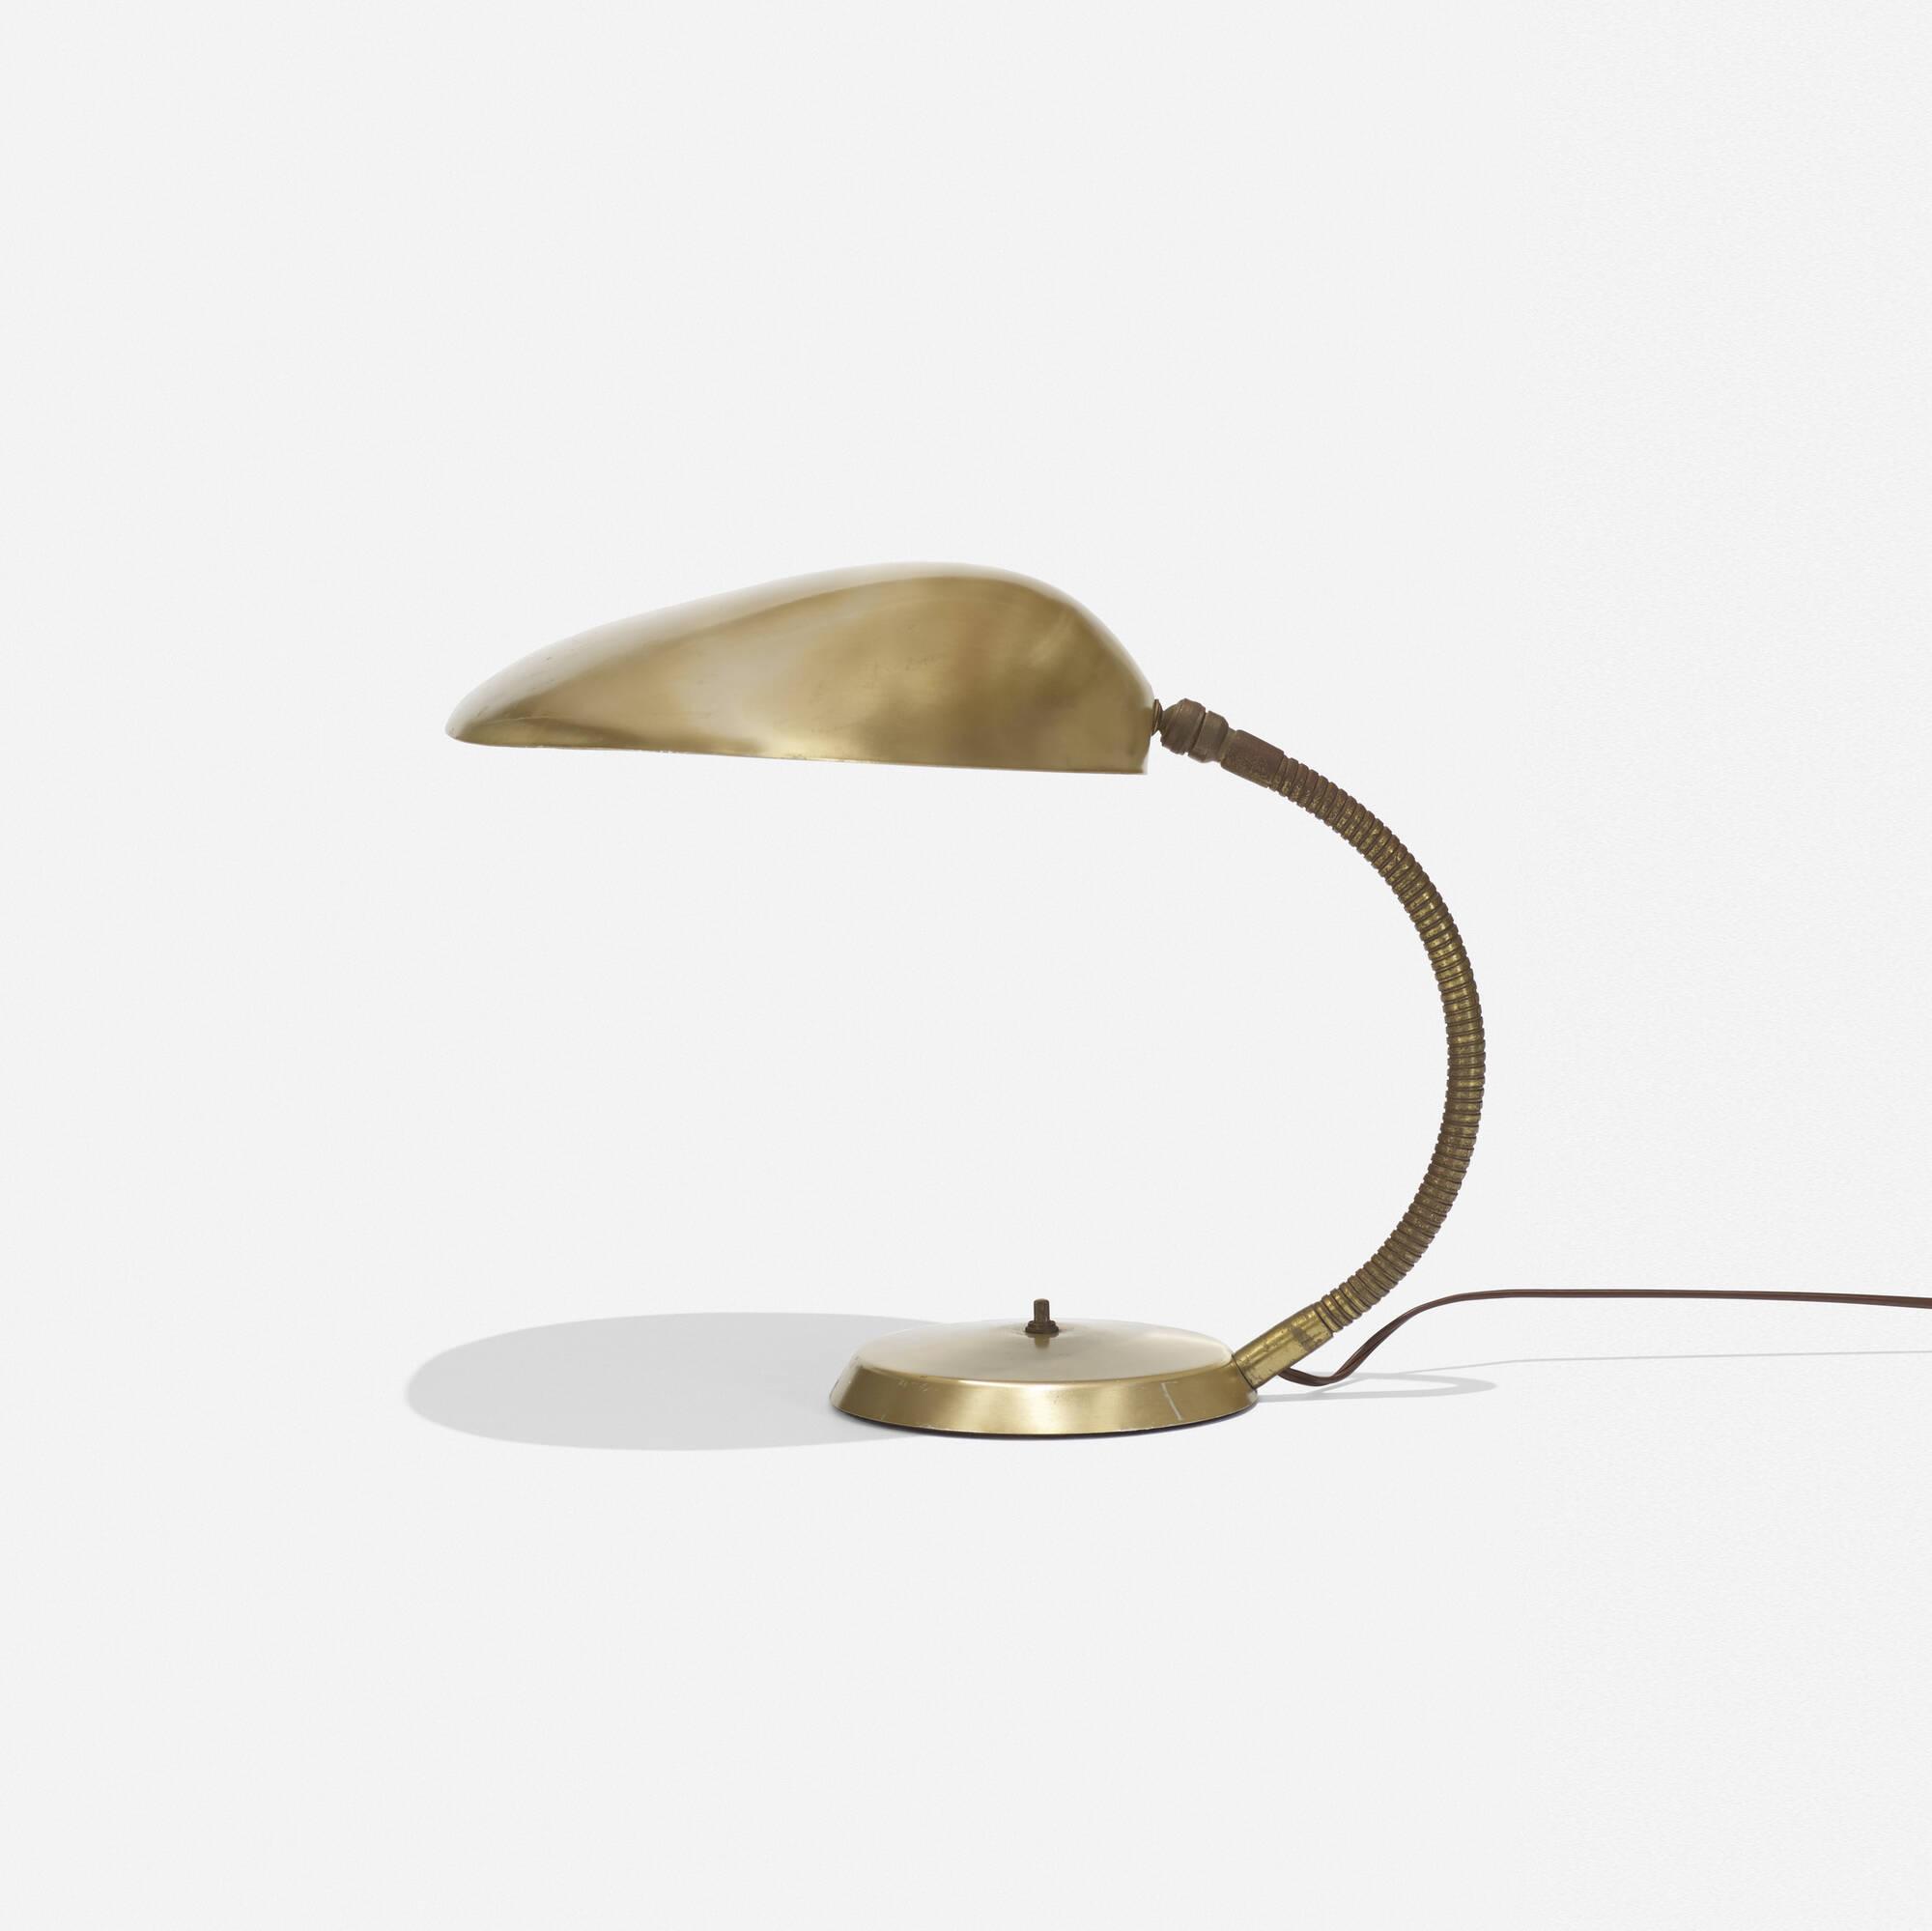 150: Greta Magnusson Grossman / Cobra table lamp (1 of 4)